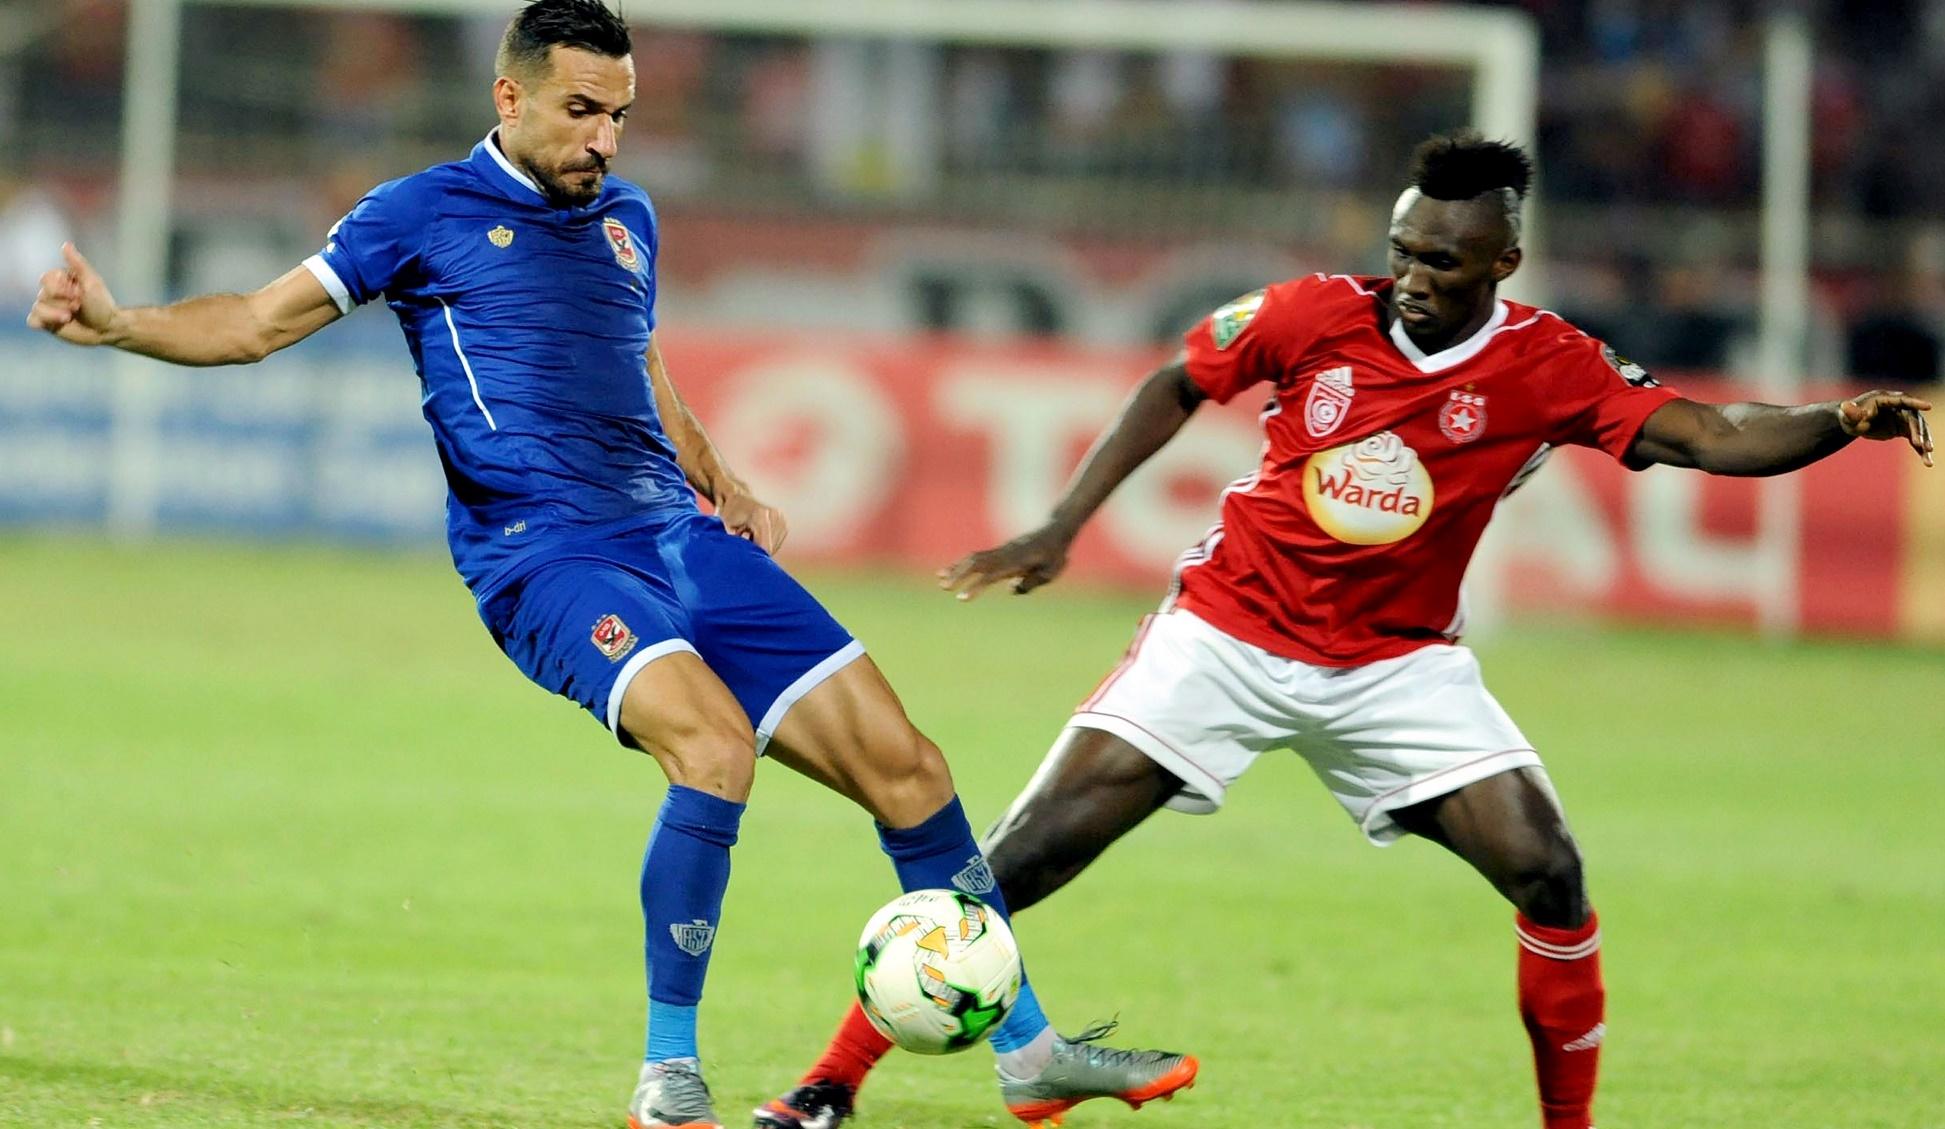 Ali Maaloul Alkhaly Bangoura Al Ahly Etoile Sahel CAF Champions League 01102017